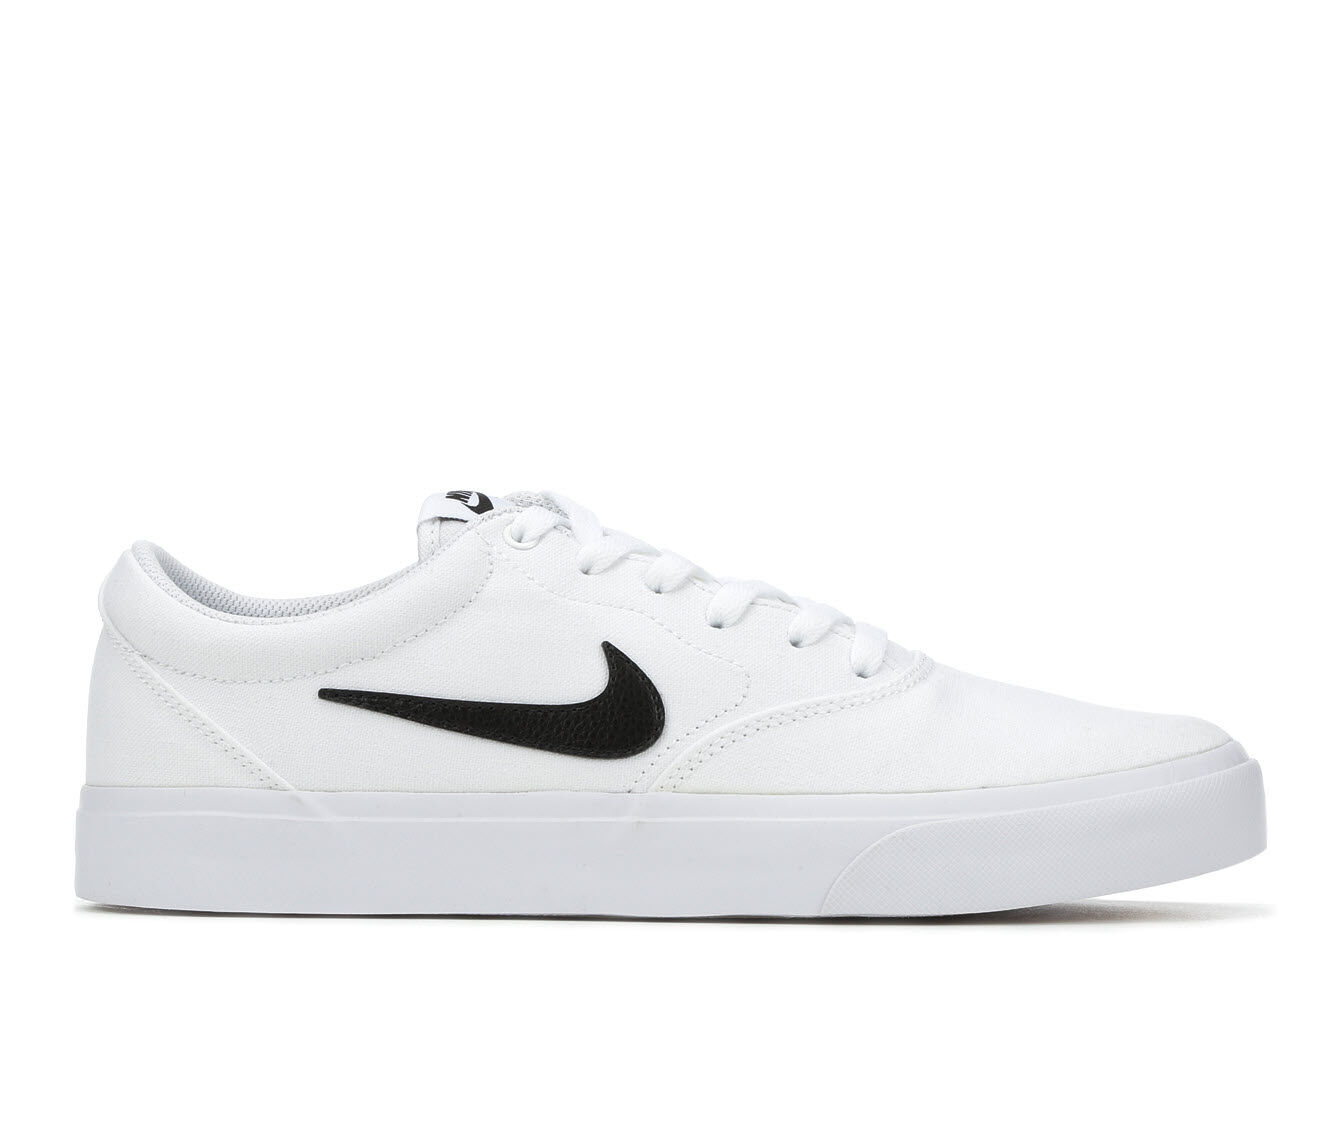 Nike SB Charge Skate Shoes | Shoe Carnival